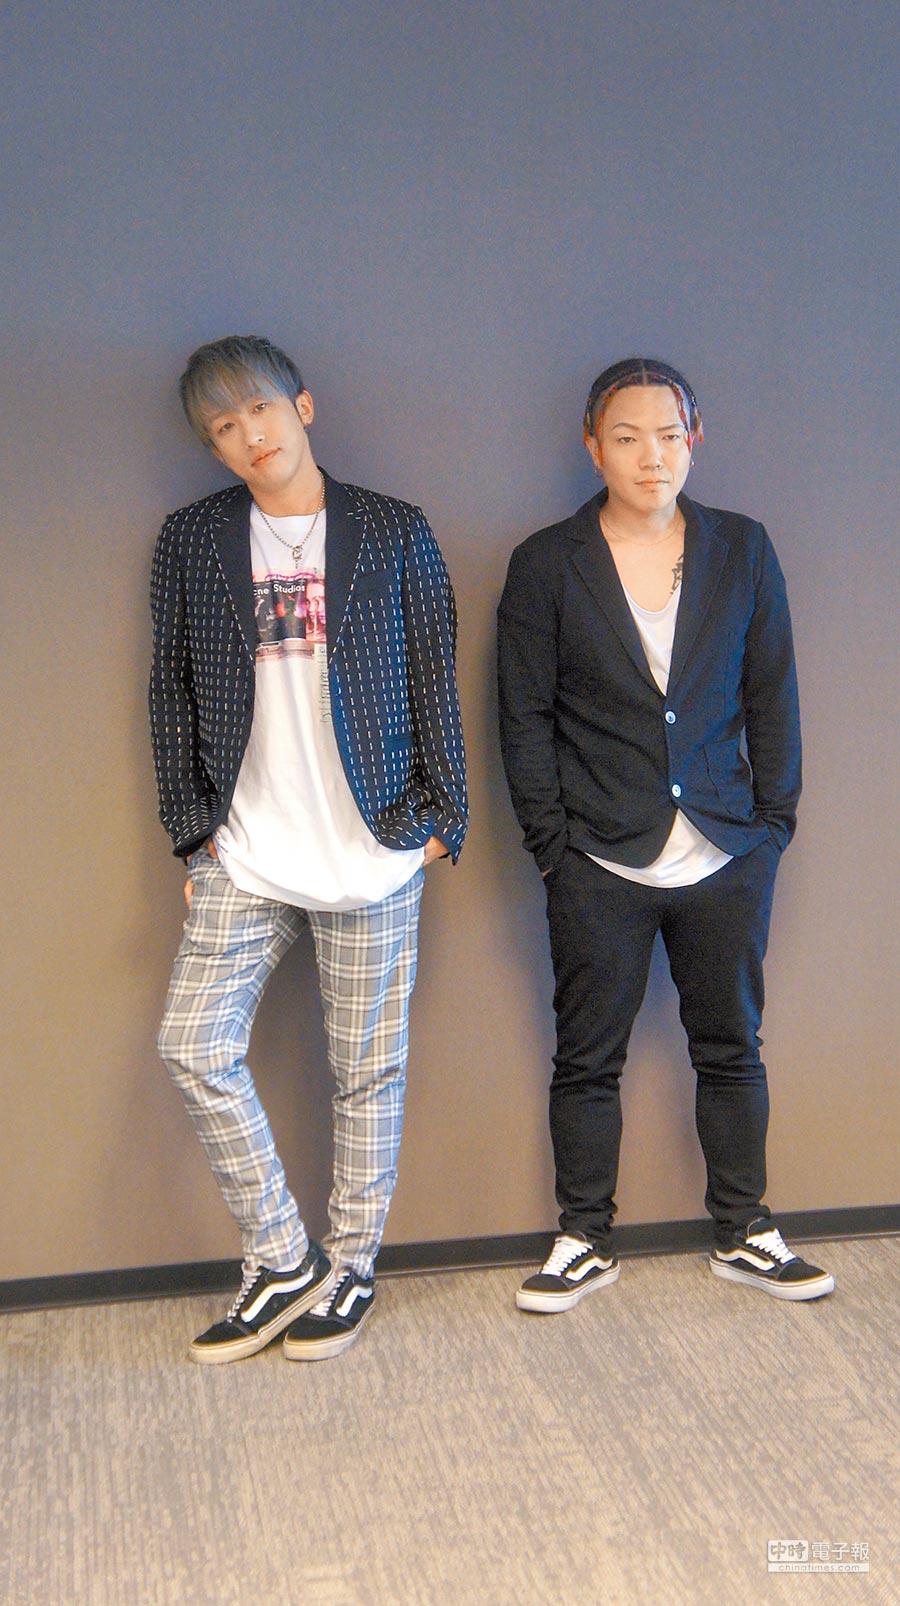 KENJI03(左)與MC TEEDA期望未來能與五月天合作。